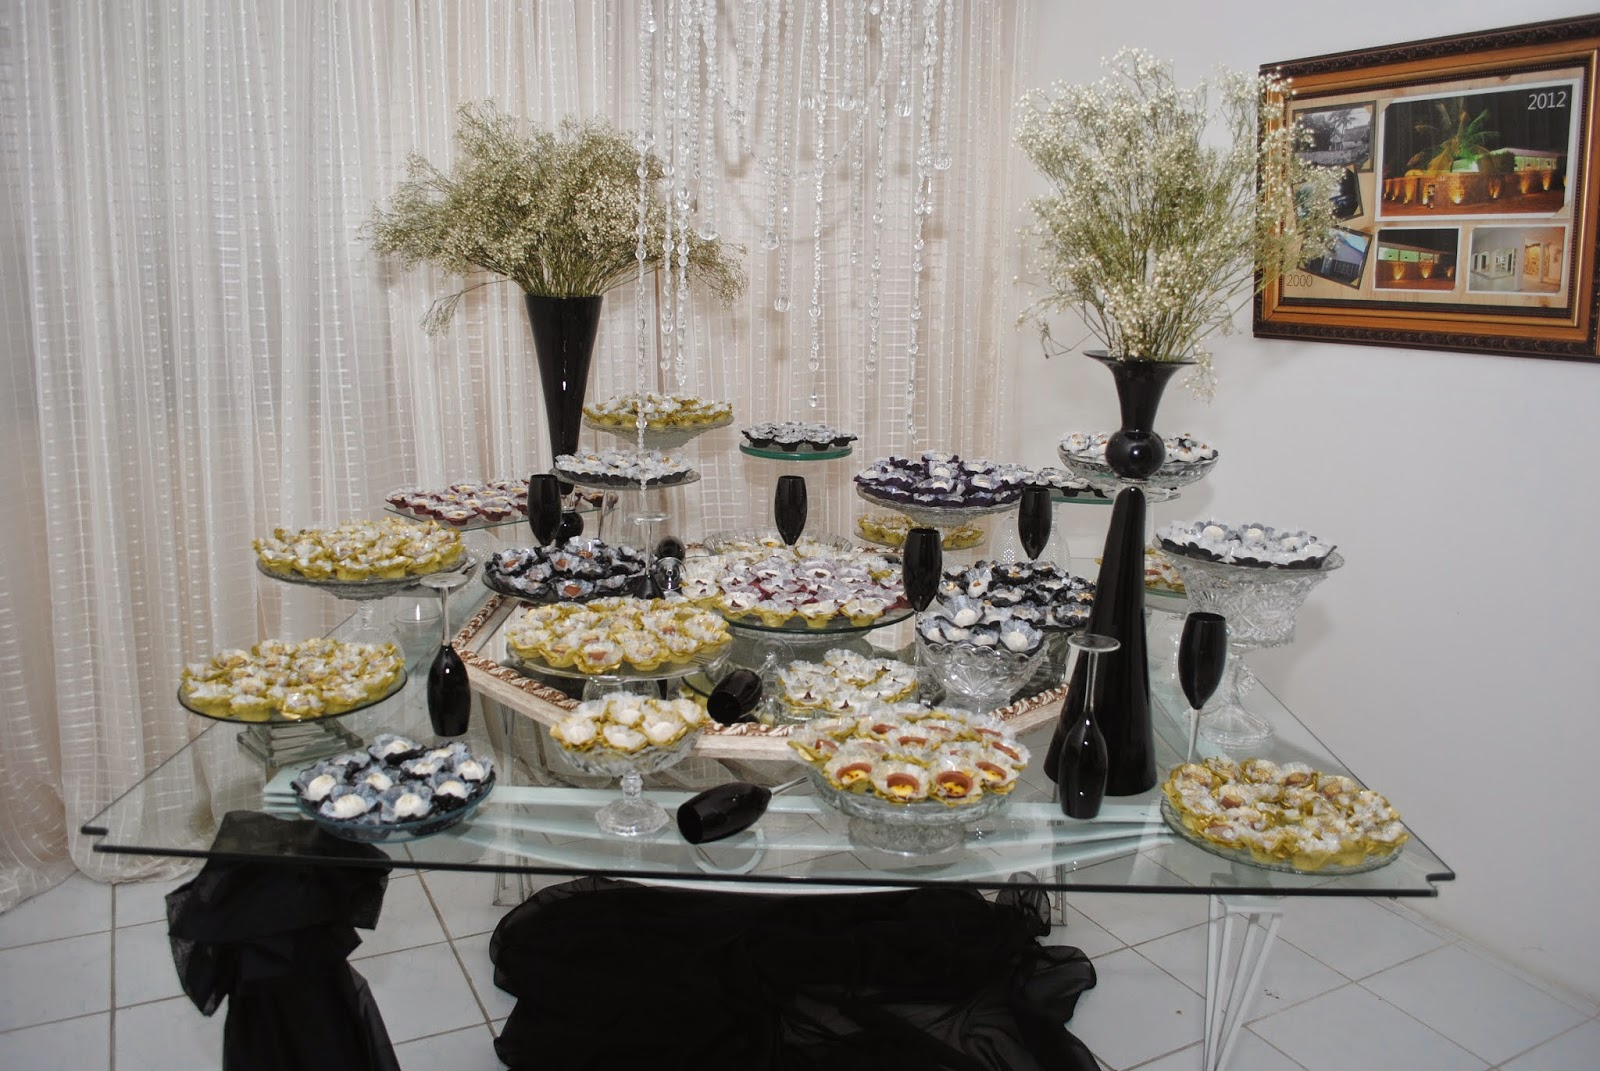 Festa de 70 anos let cia vit ria buffet e recep es for Diseno de interiores anos 70